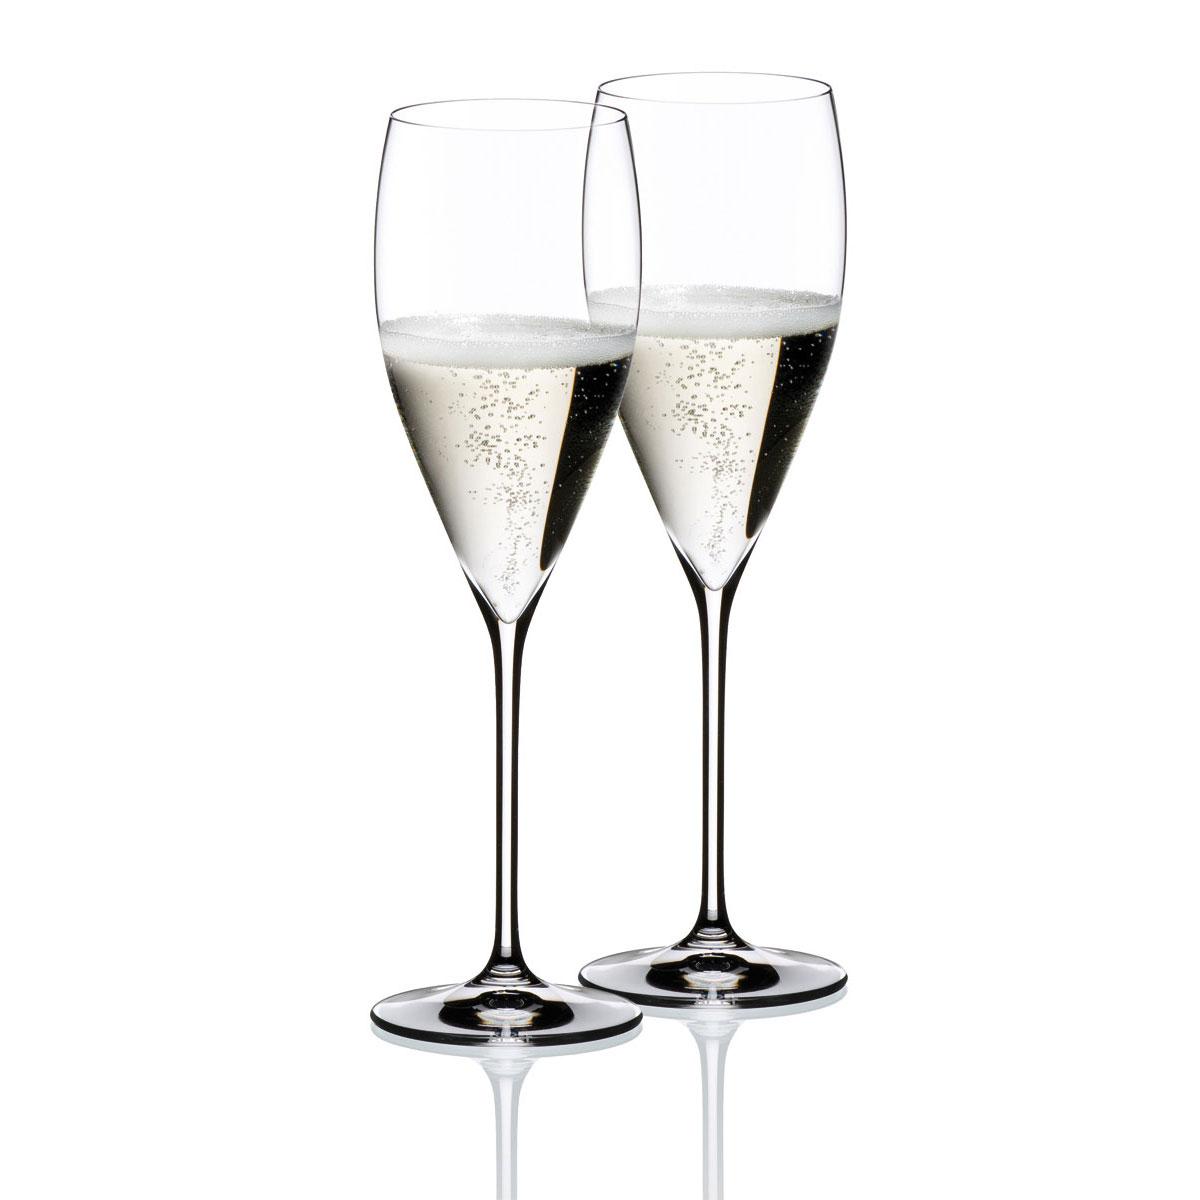 Riedel Vinum Champagne Glasses, Pair